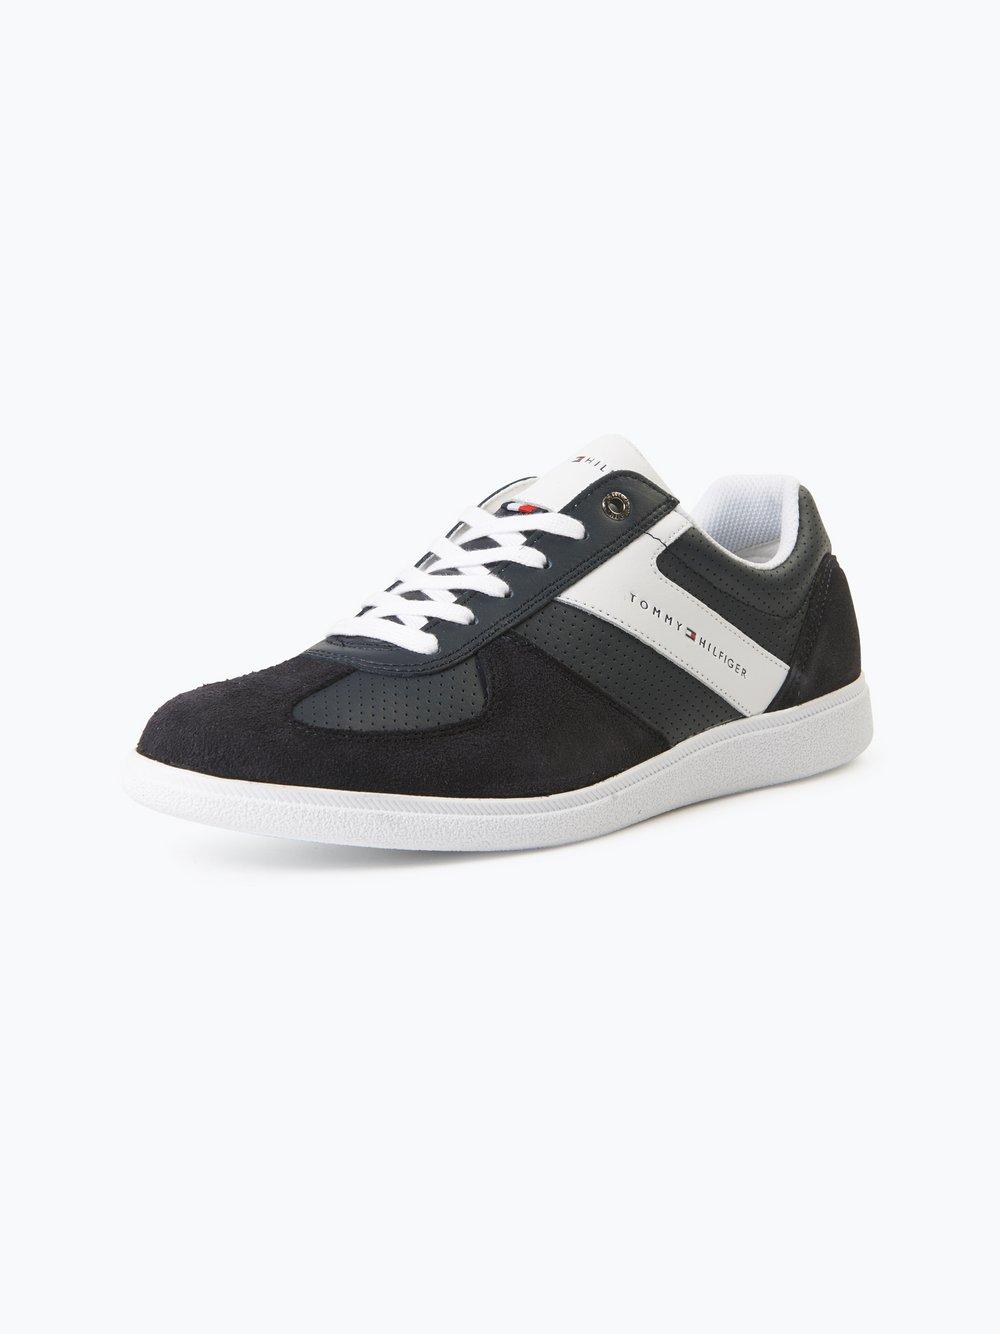 Tommy Hilfiger Leder Sneaker: 18 Produkte im Angebot | Stylight